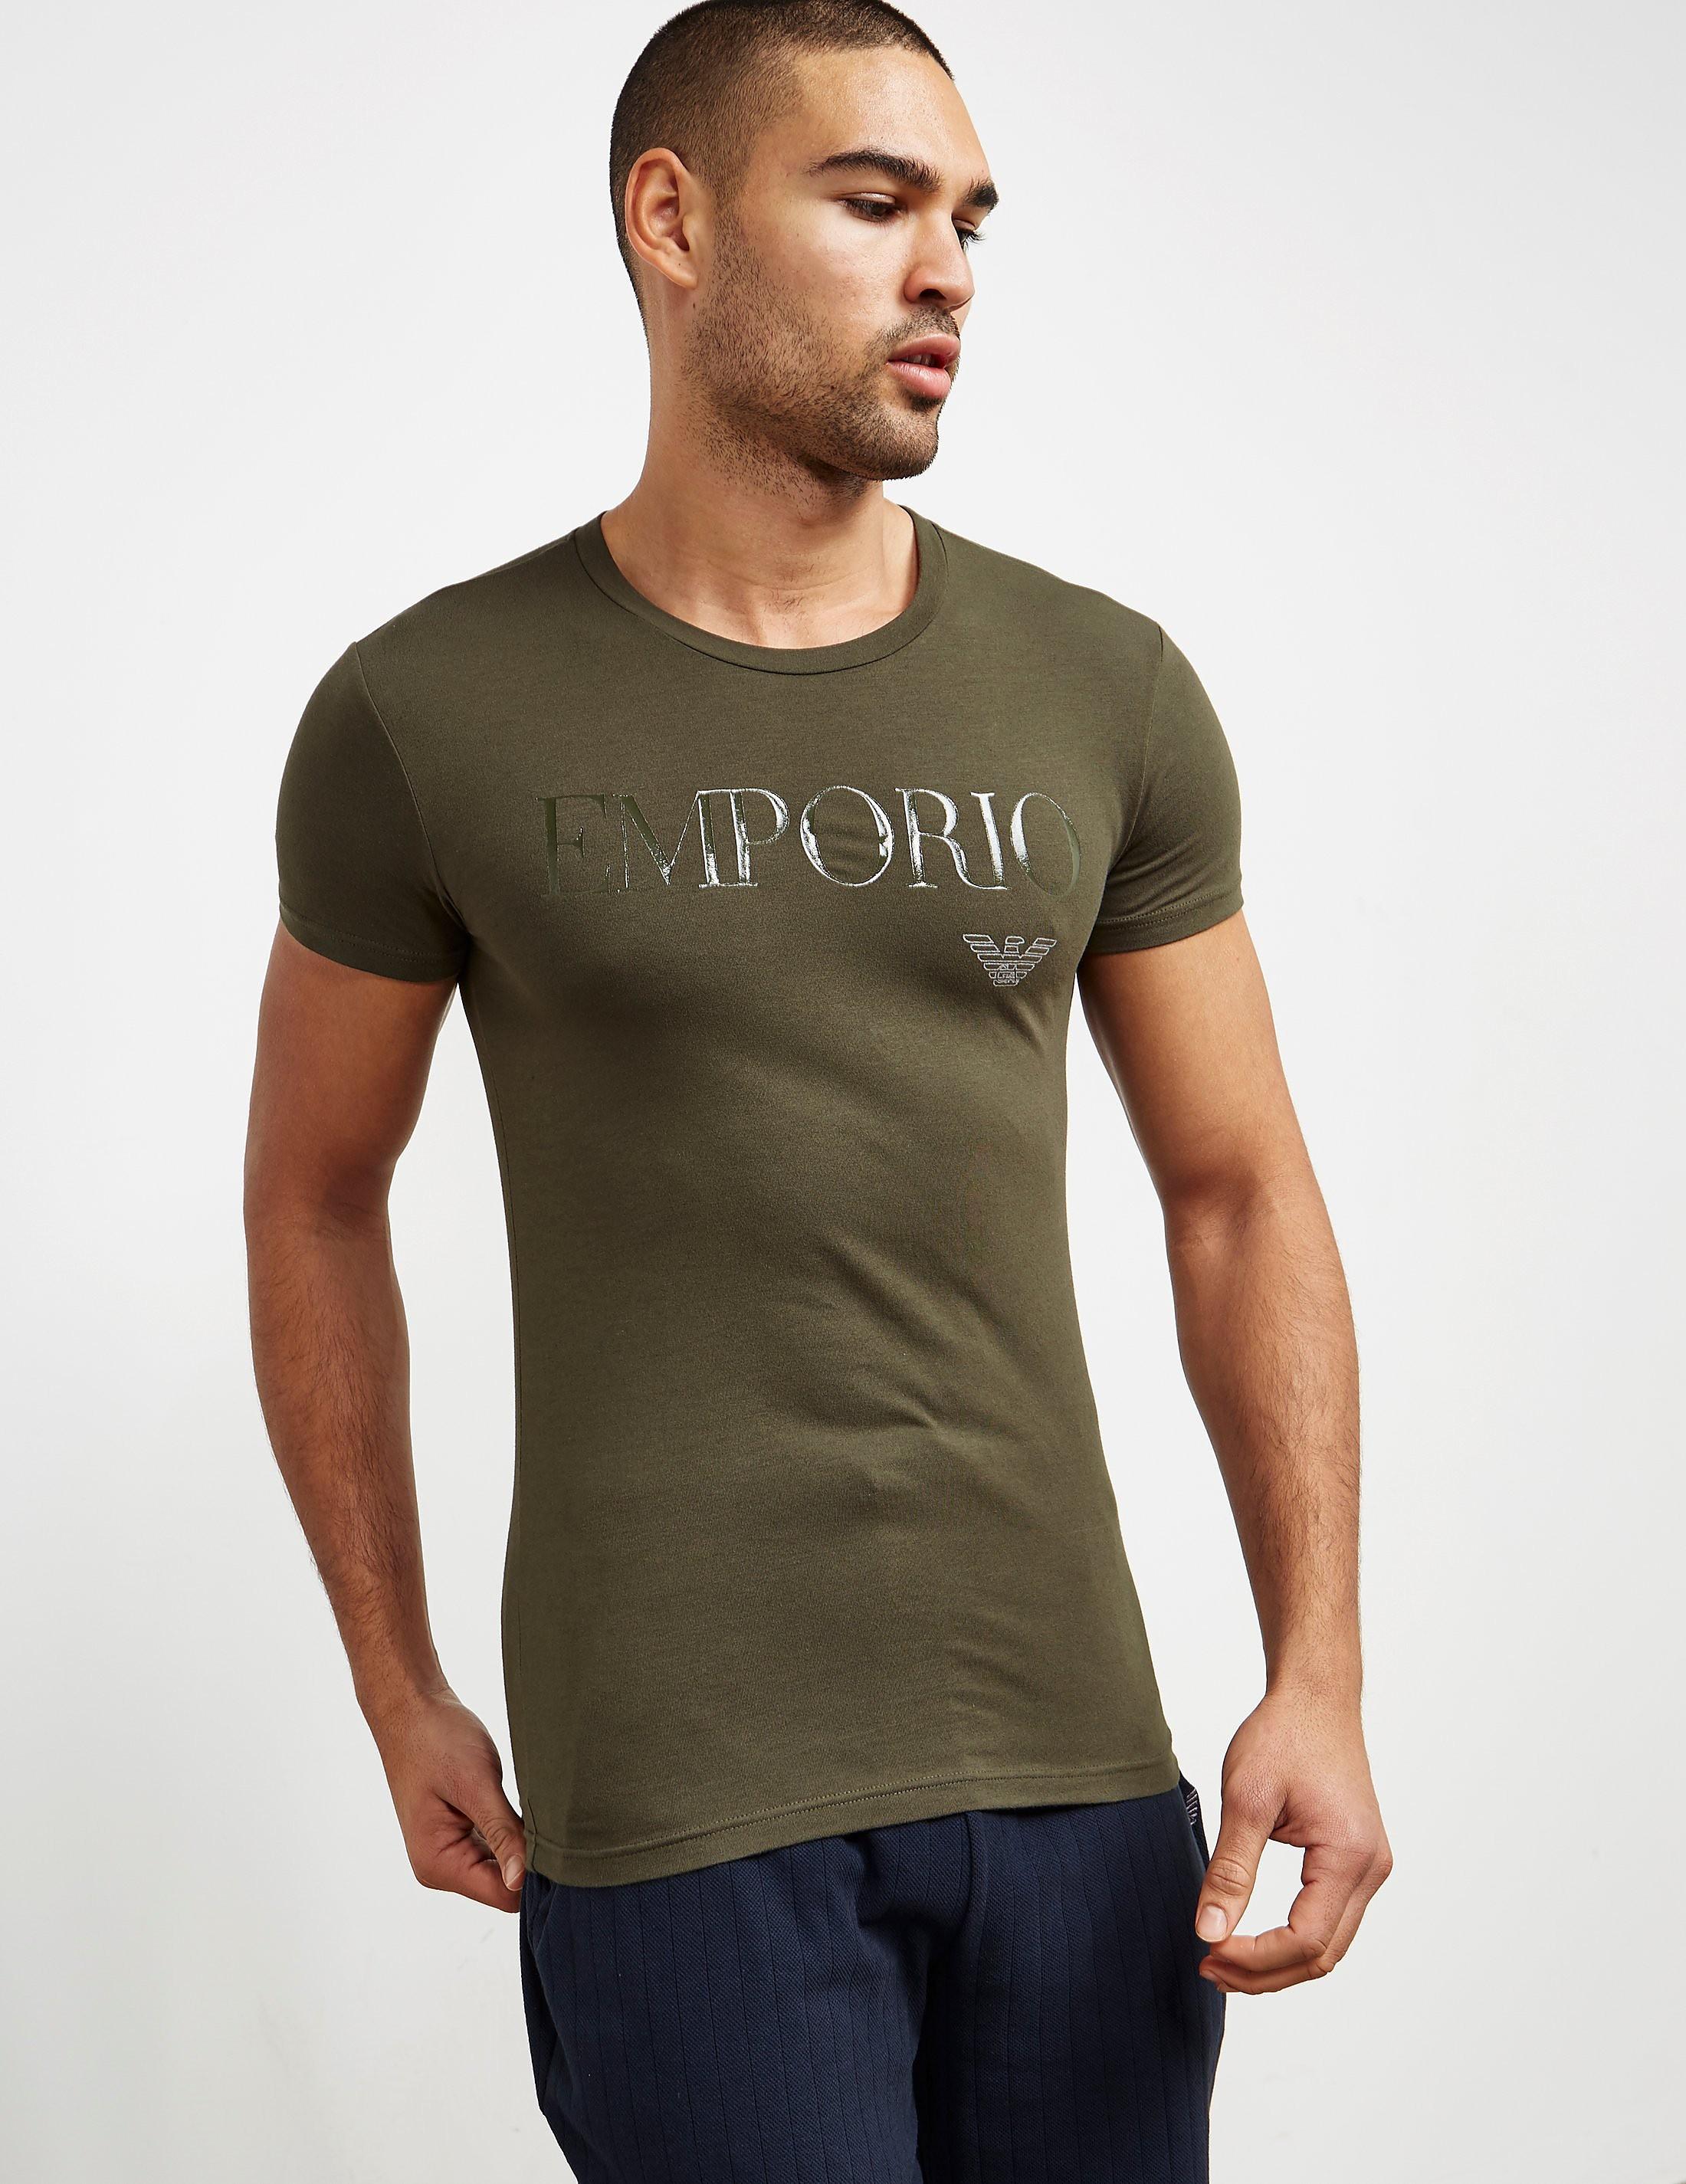 Emporio Armani Gel Print Short Sleeve T-Shirt